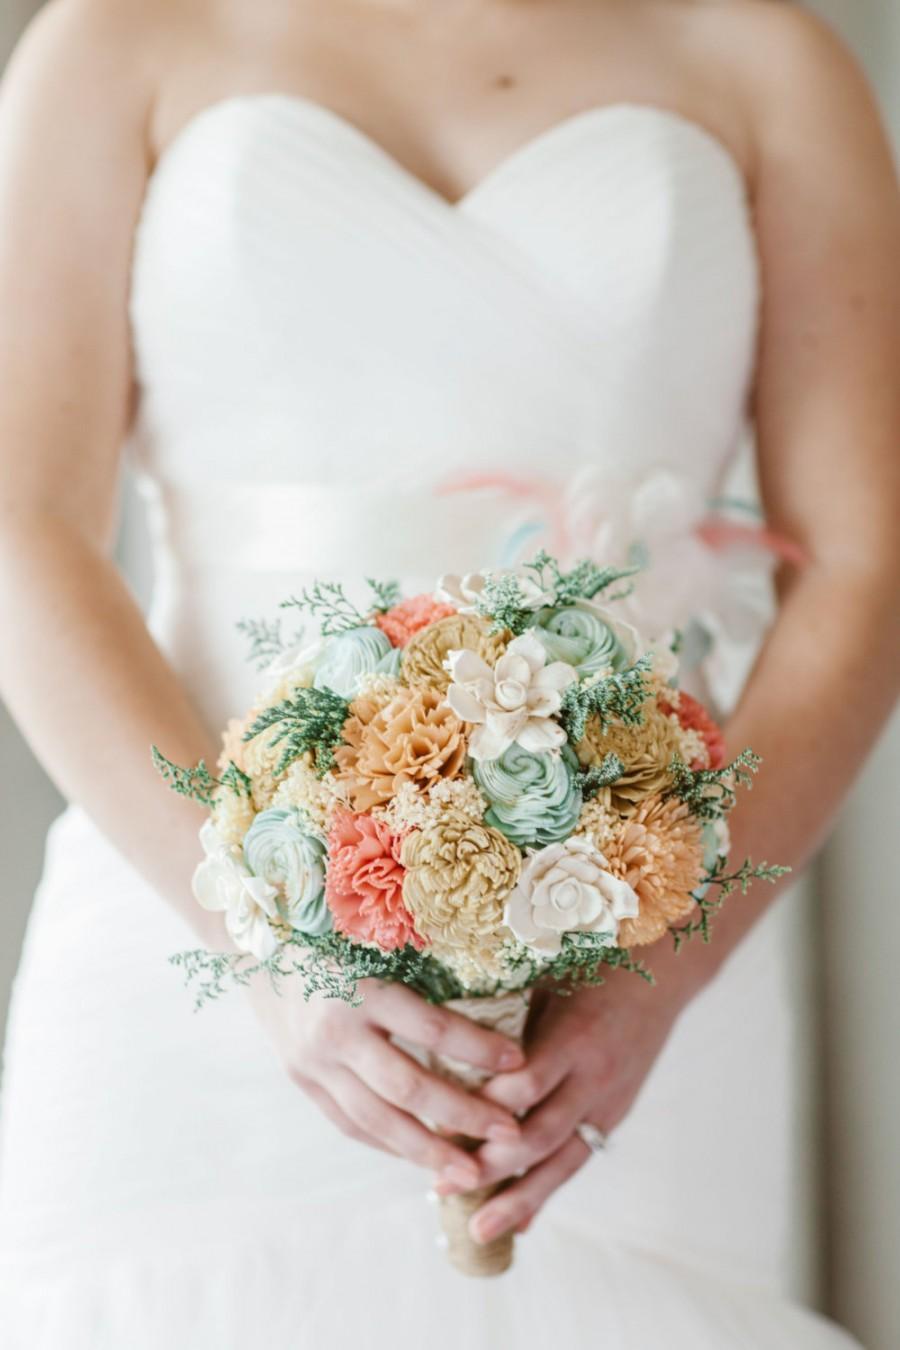 Mariage - Handmade Wedding Bouquet- Mint Coral Peach Champagne Bridal Bouquet, Alternative Bouquet, Sola Flowers, Keepsake Bouquet, Rustic Wedding